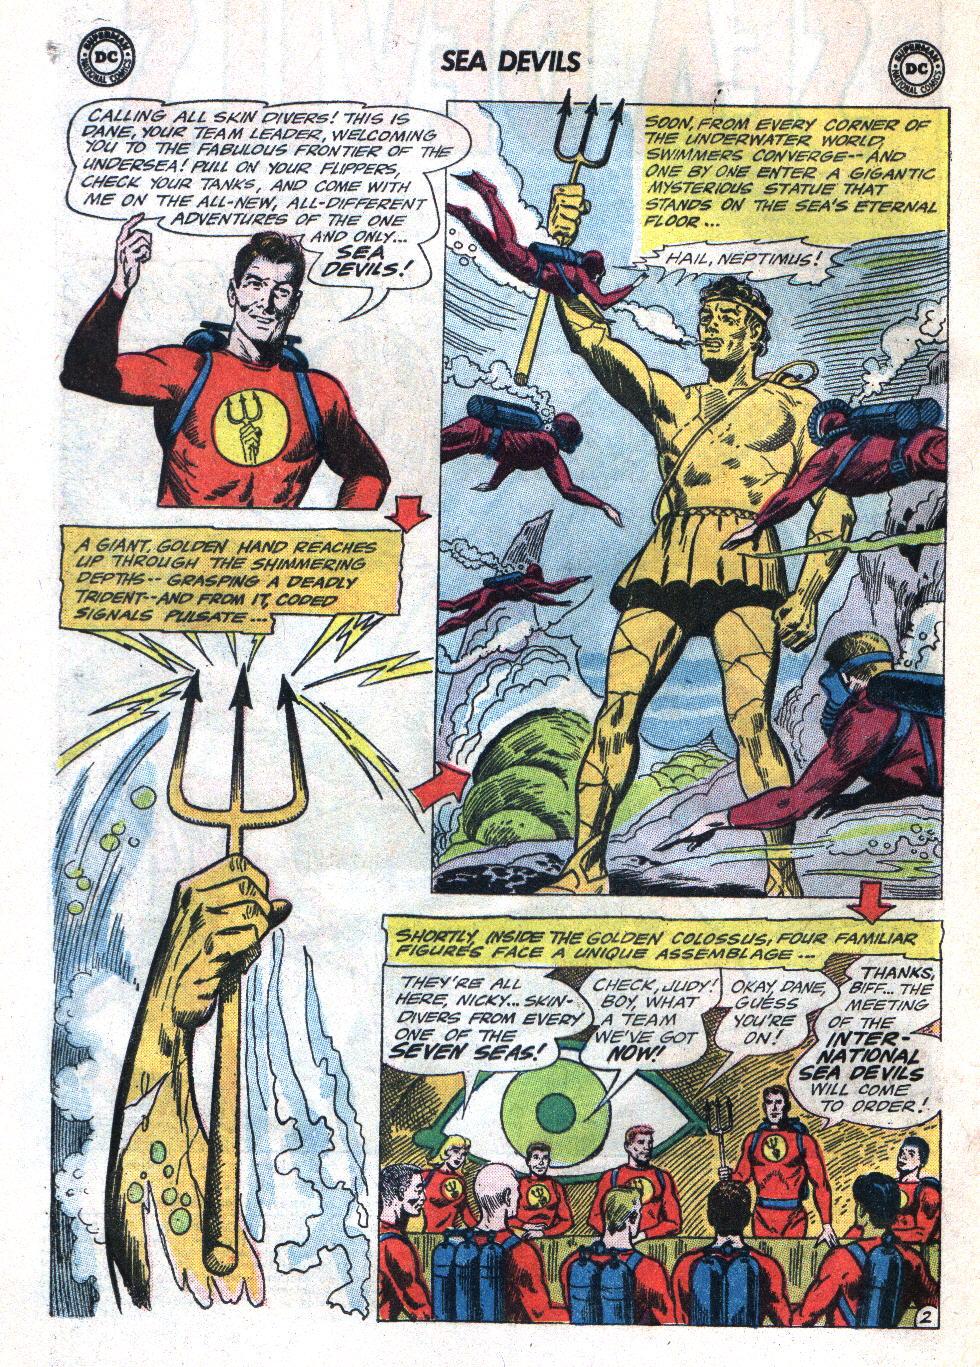 Read online Sea Devils comic -  Issue #22 - 4